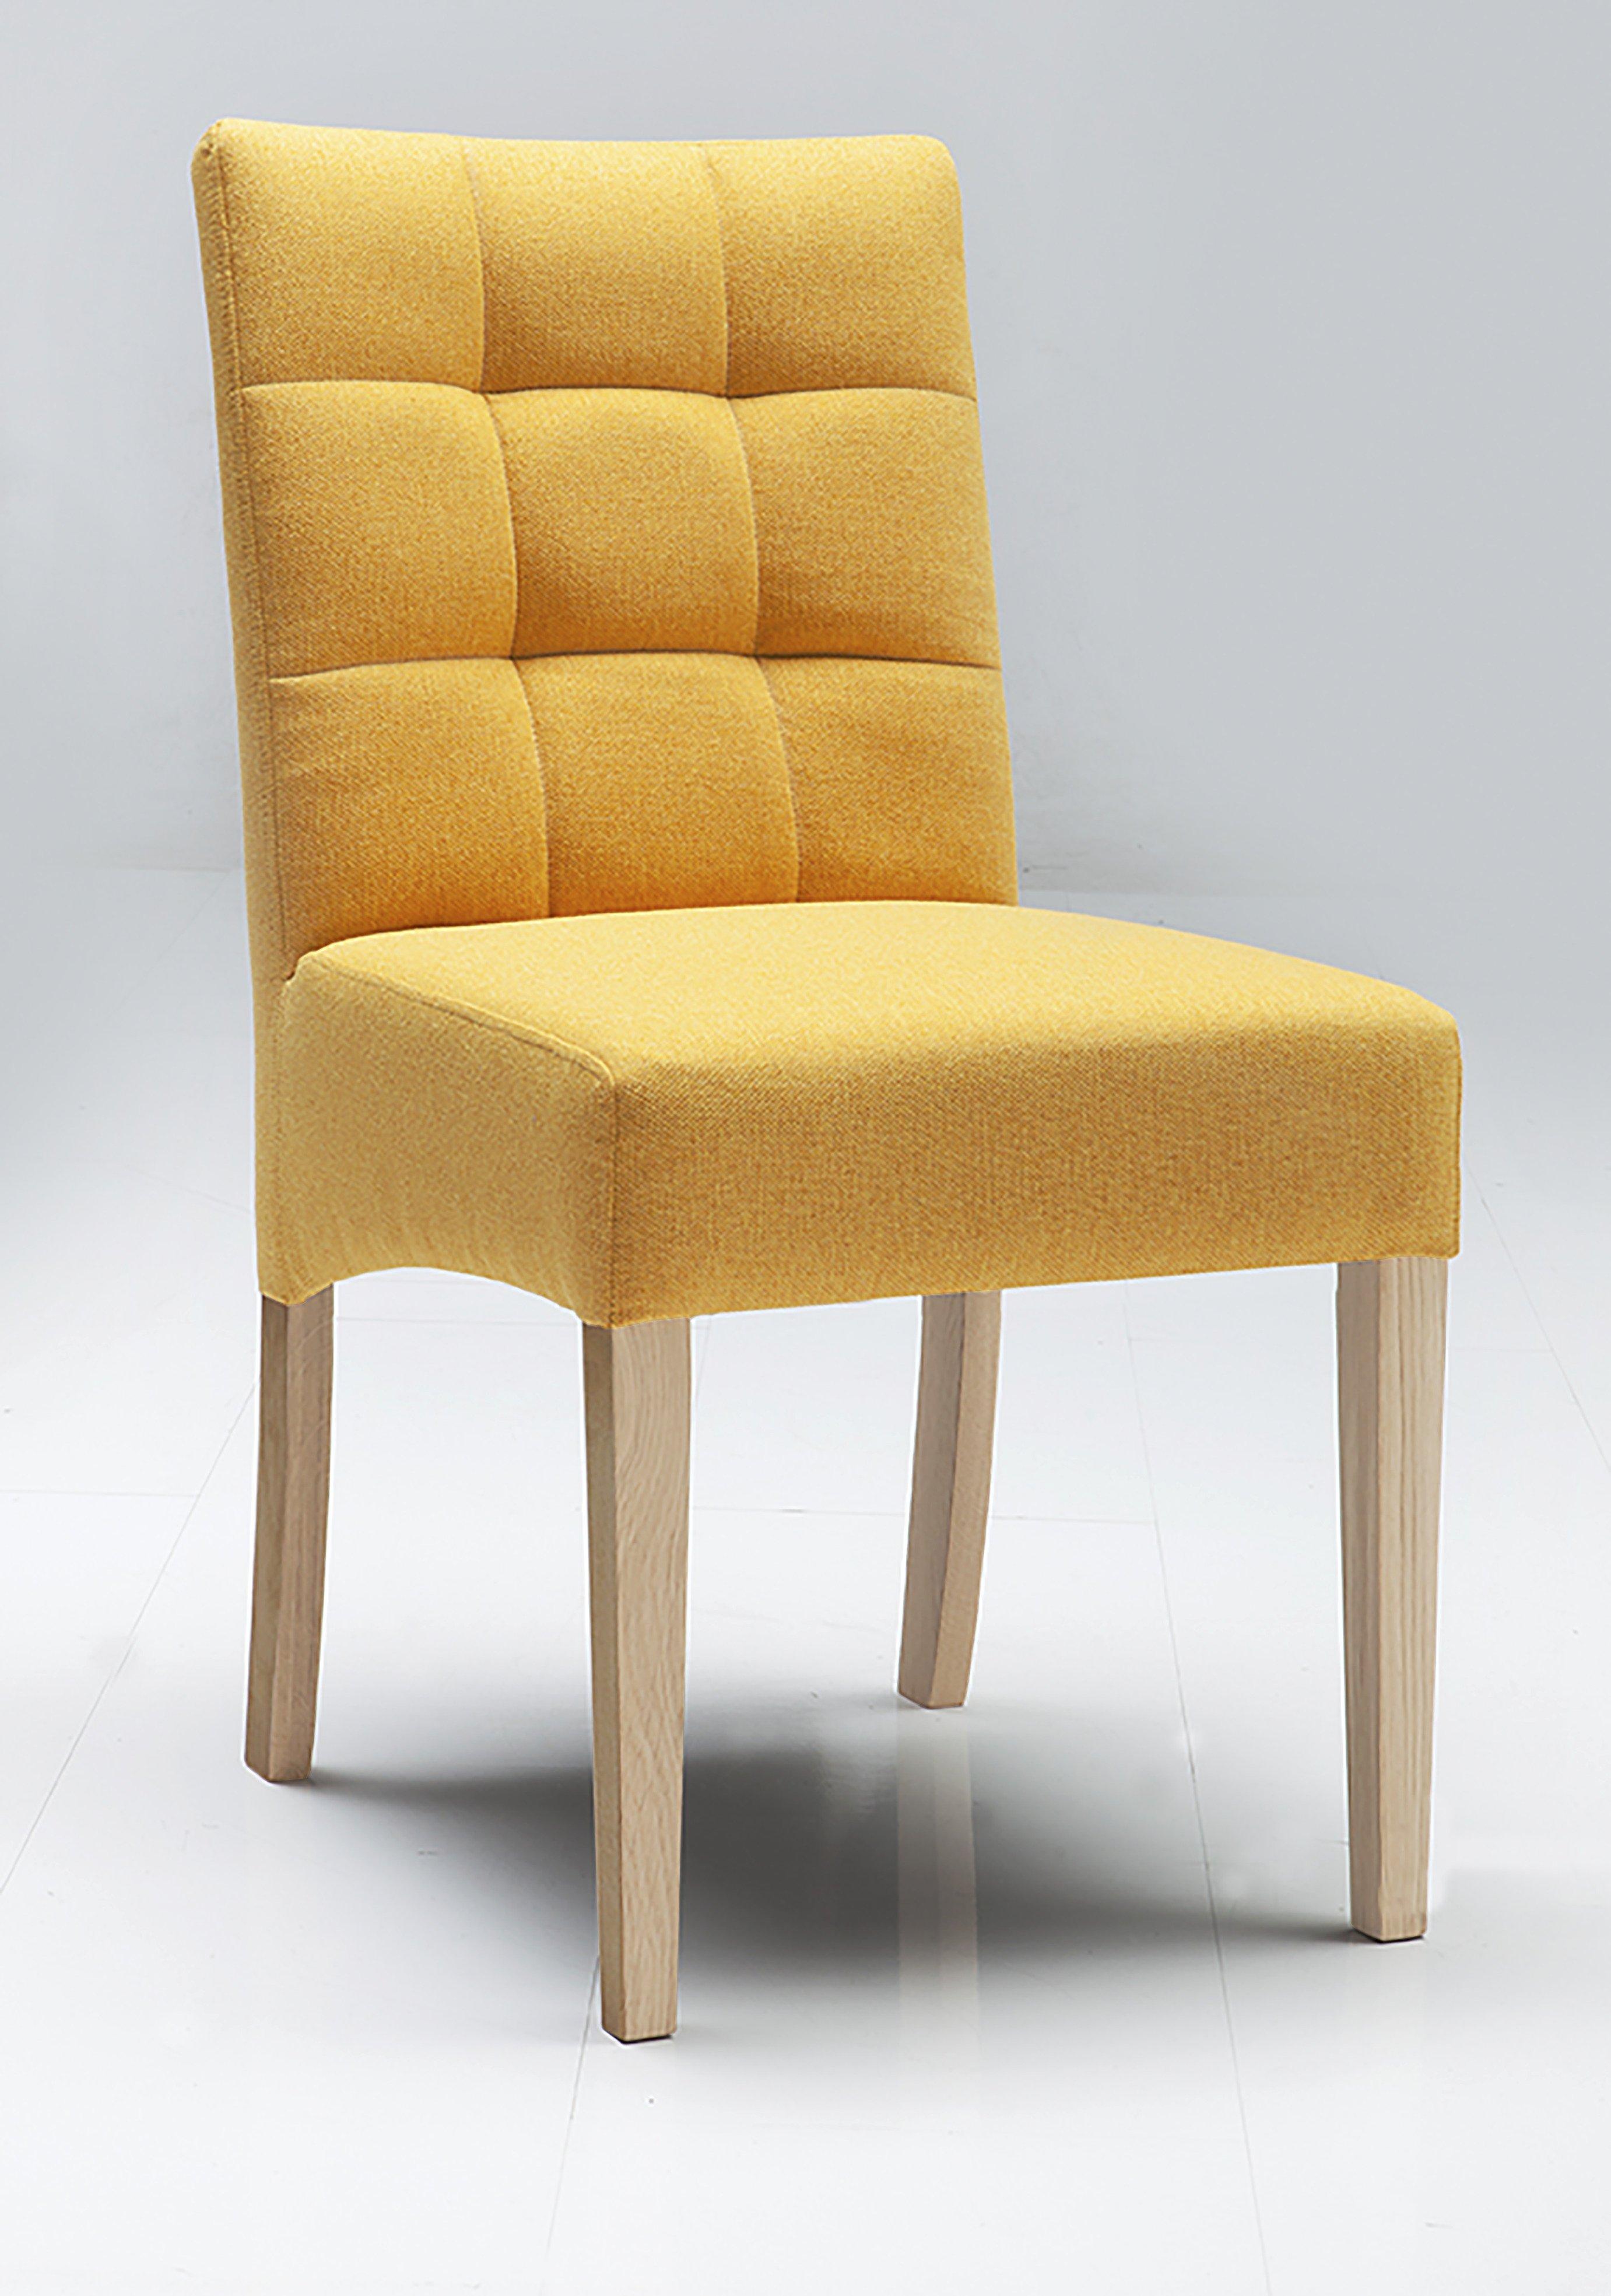 Polsterstuhl Capi  Holz/Eiche,Kunstfaser (Chemiefaser),Mikrofaser (Textilfaser)